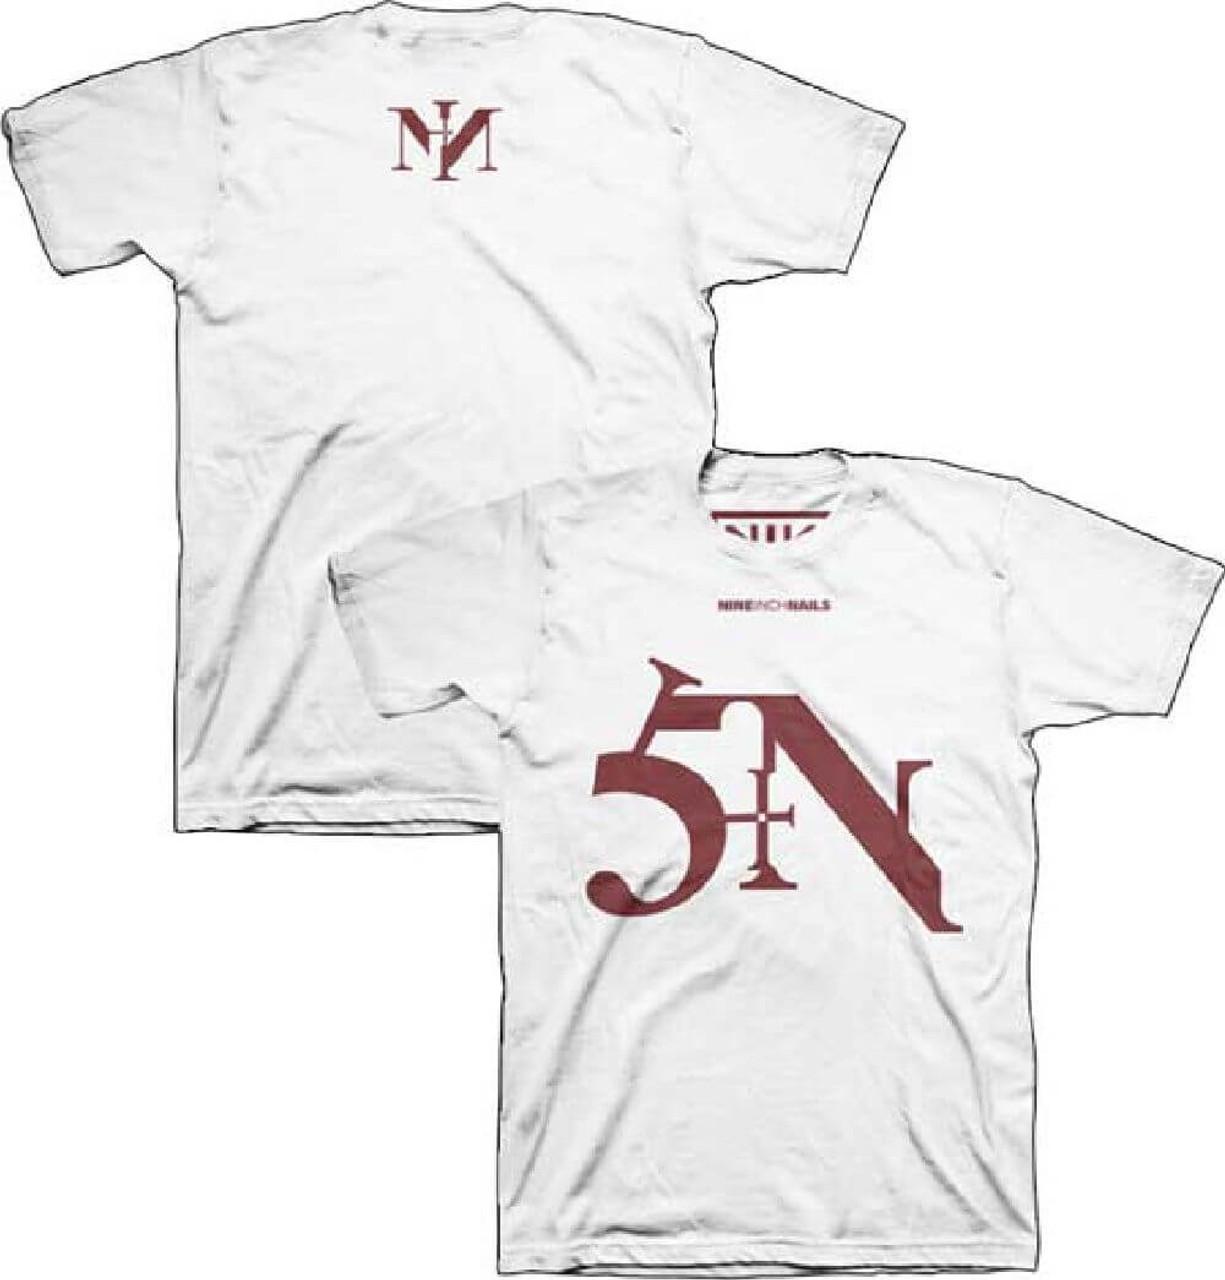 Nine Inch Nails Sin Song Single Album Cover Artwork Men\'s T-shirt